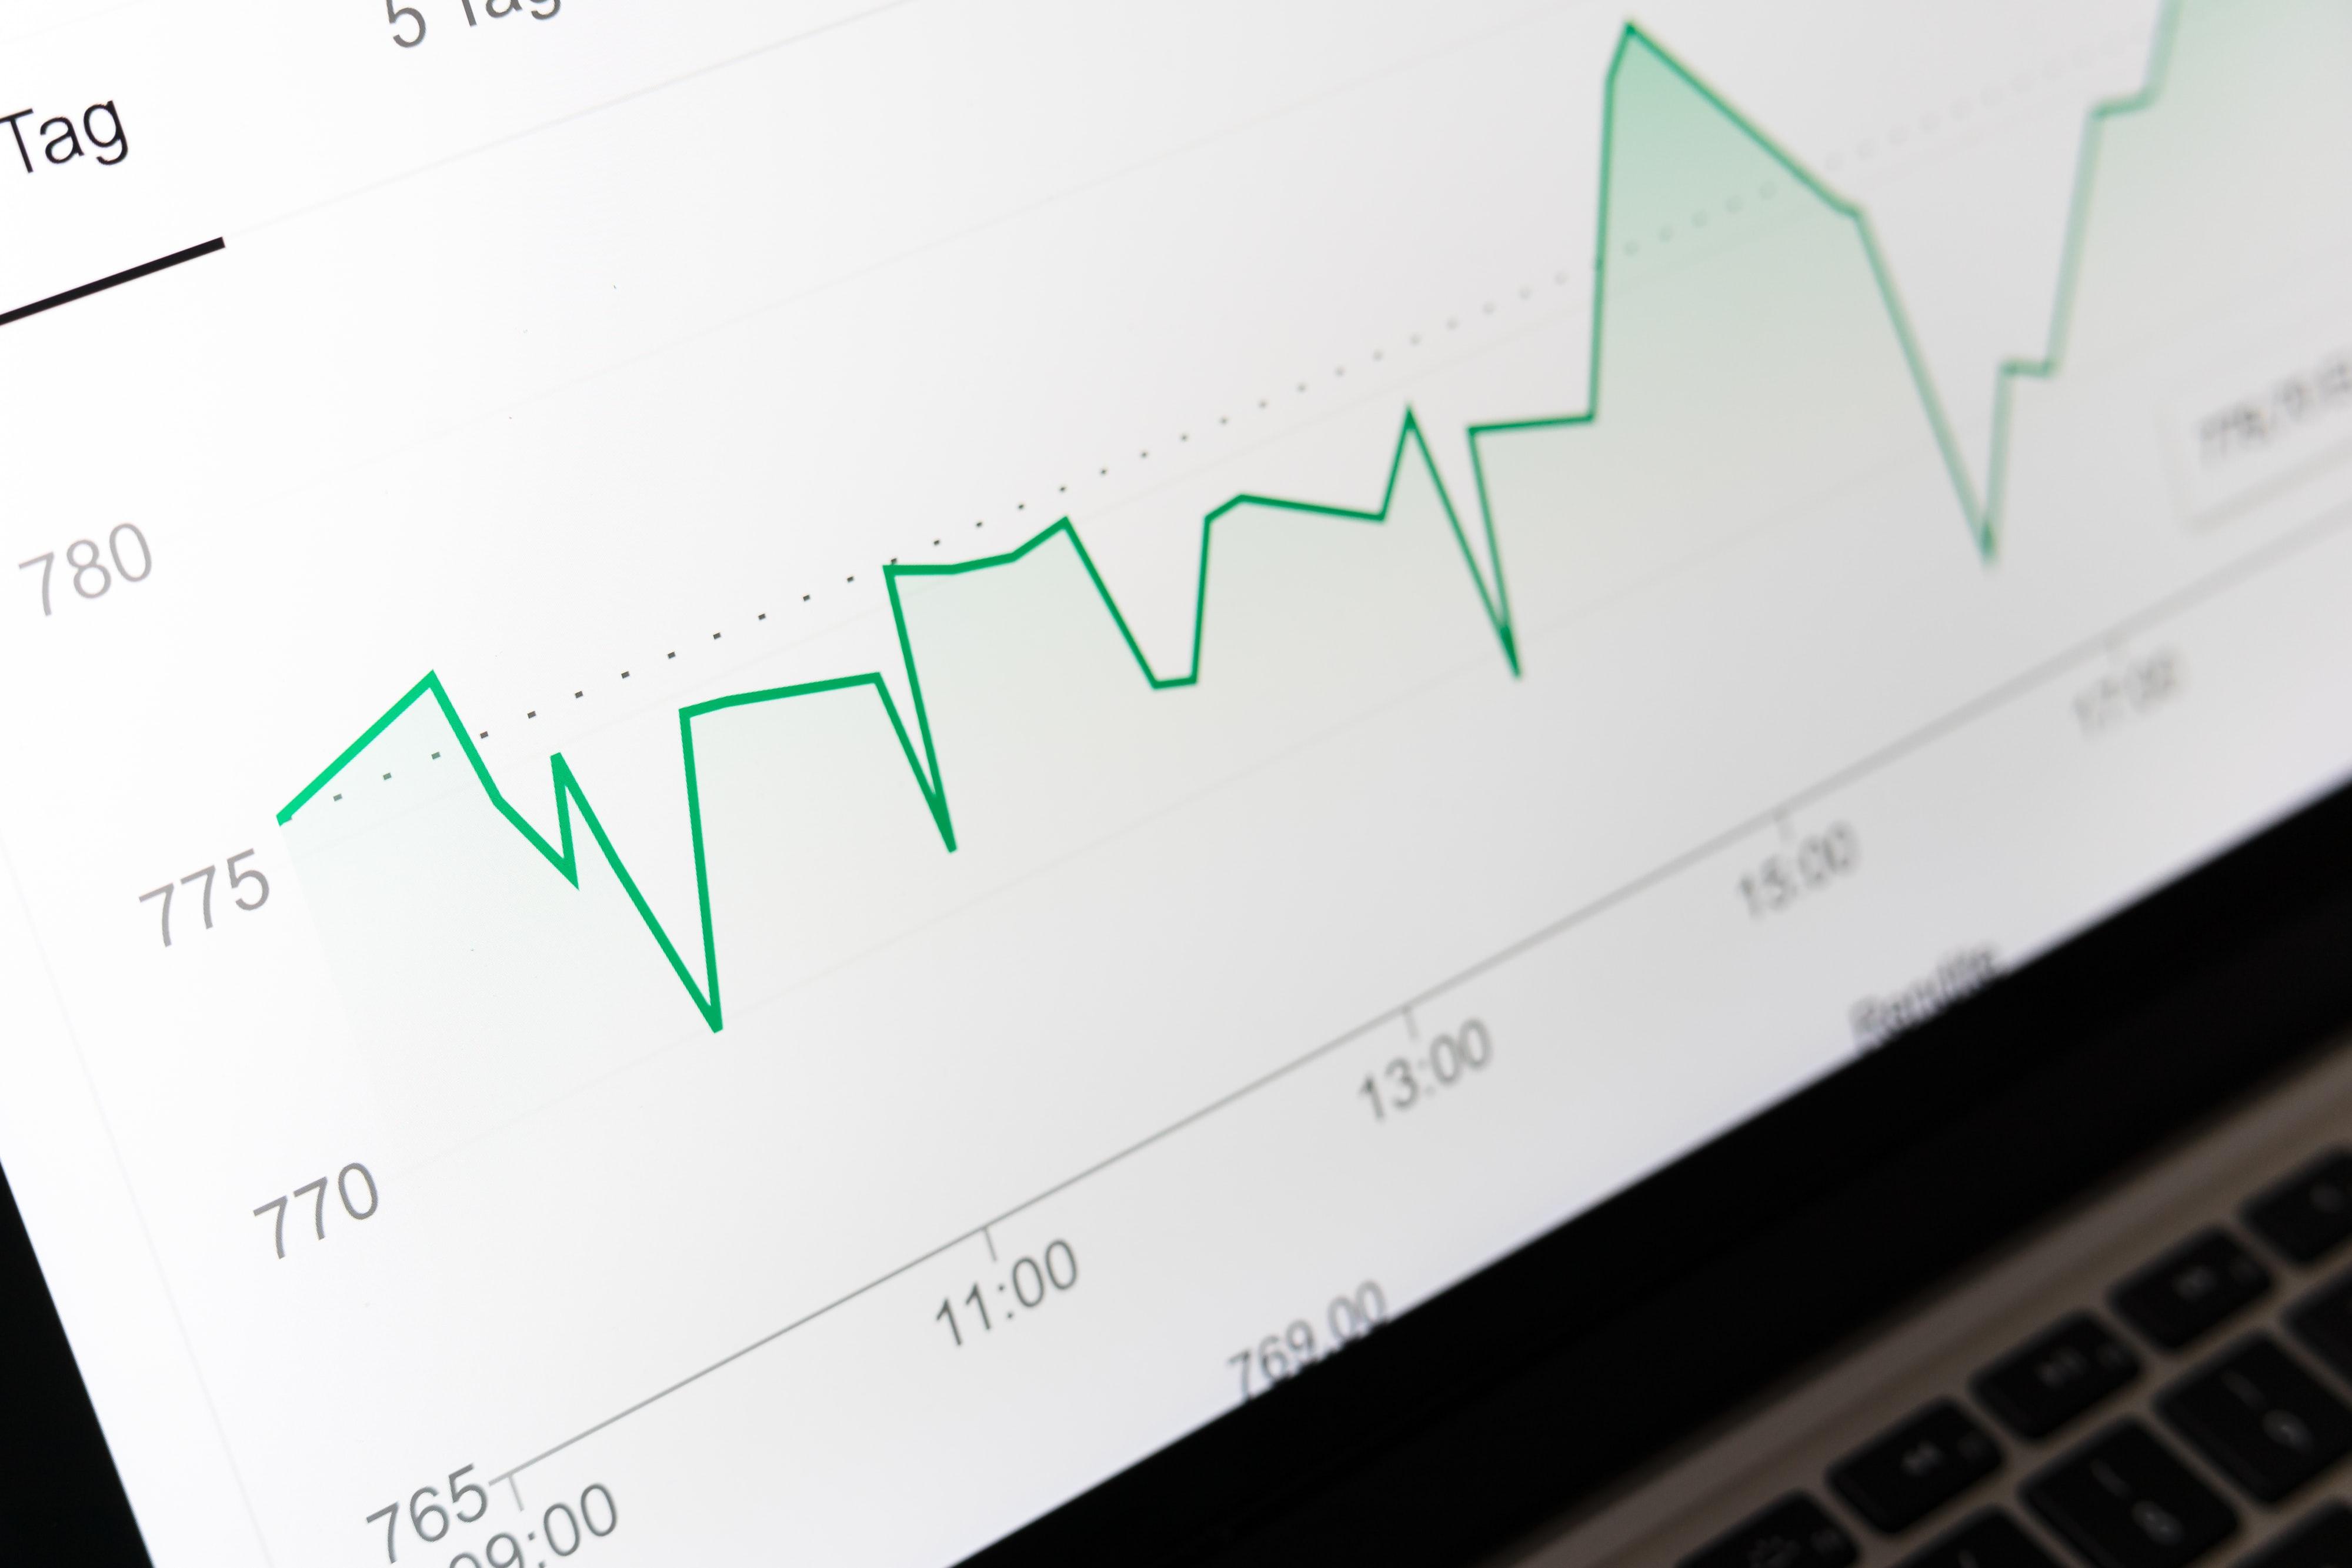 Webinar on measuring innovation with the fuller landau digital maturity index